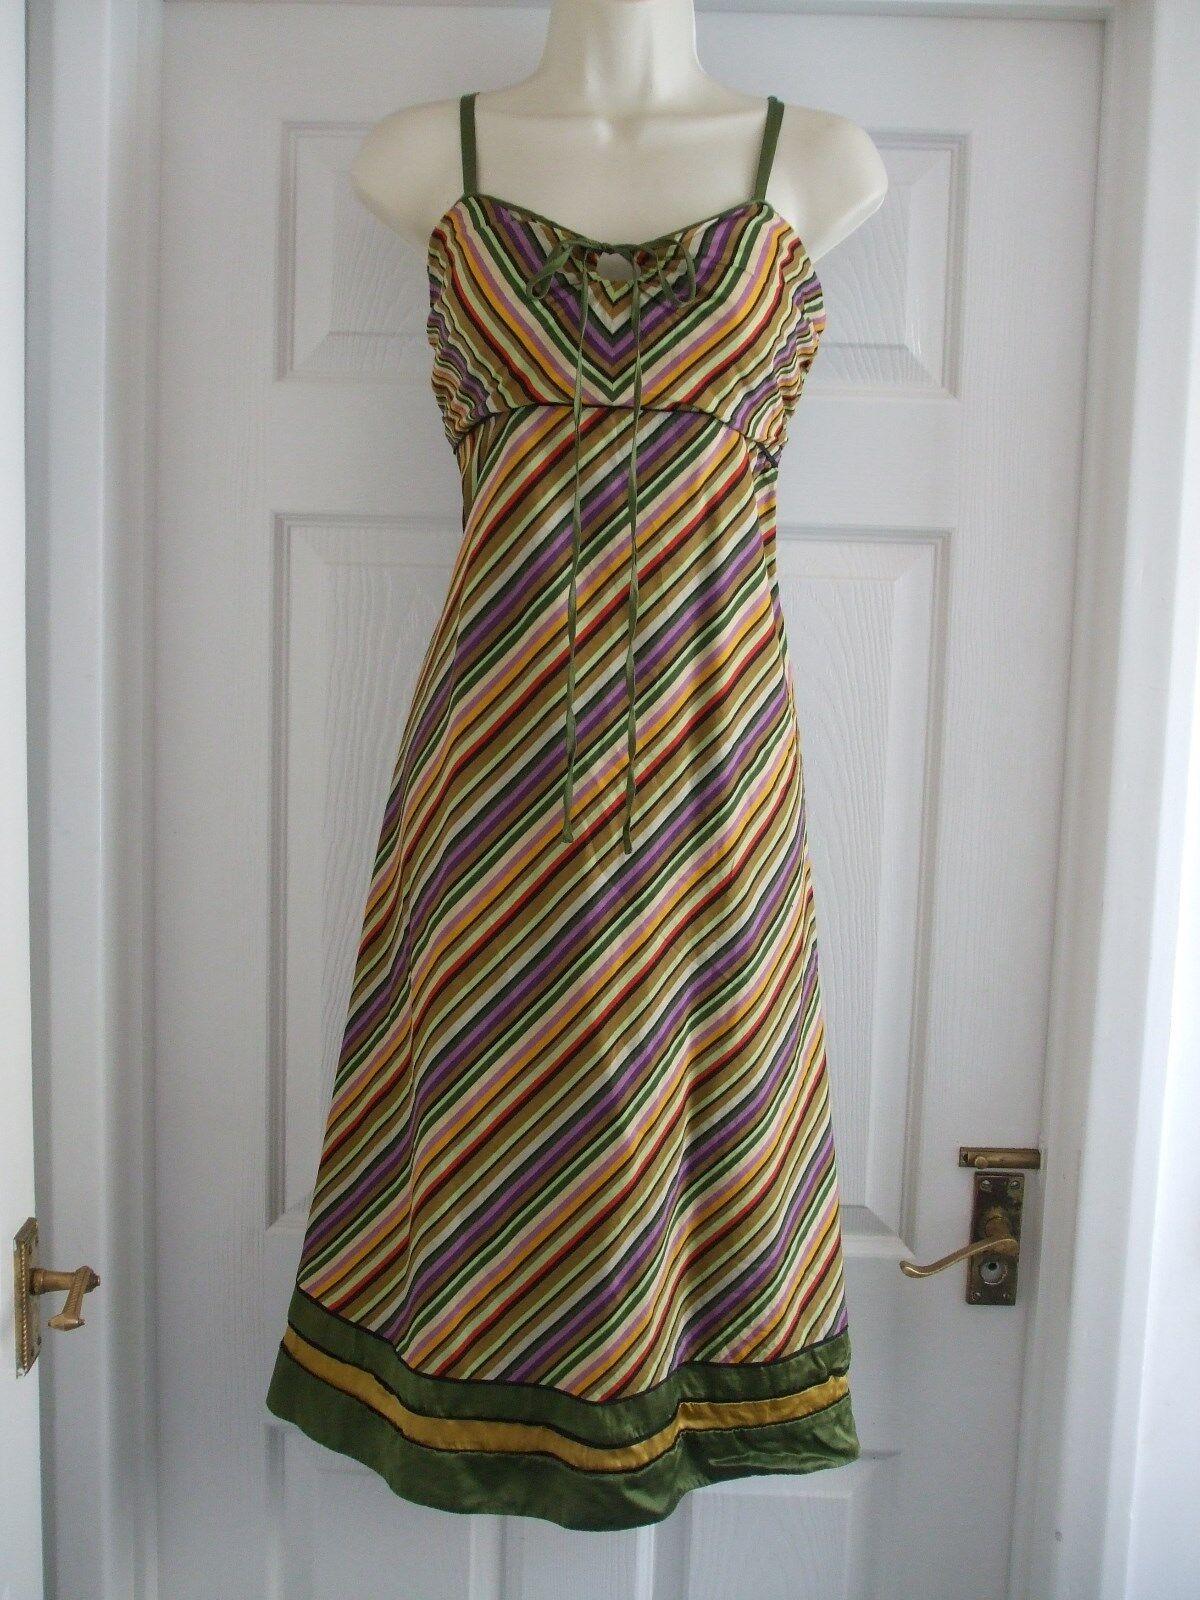 E Womens Size 14 Linea Multi Stripy Dress LADIES SUMMER SMART WORK EVENING PARTY